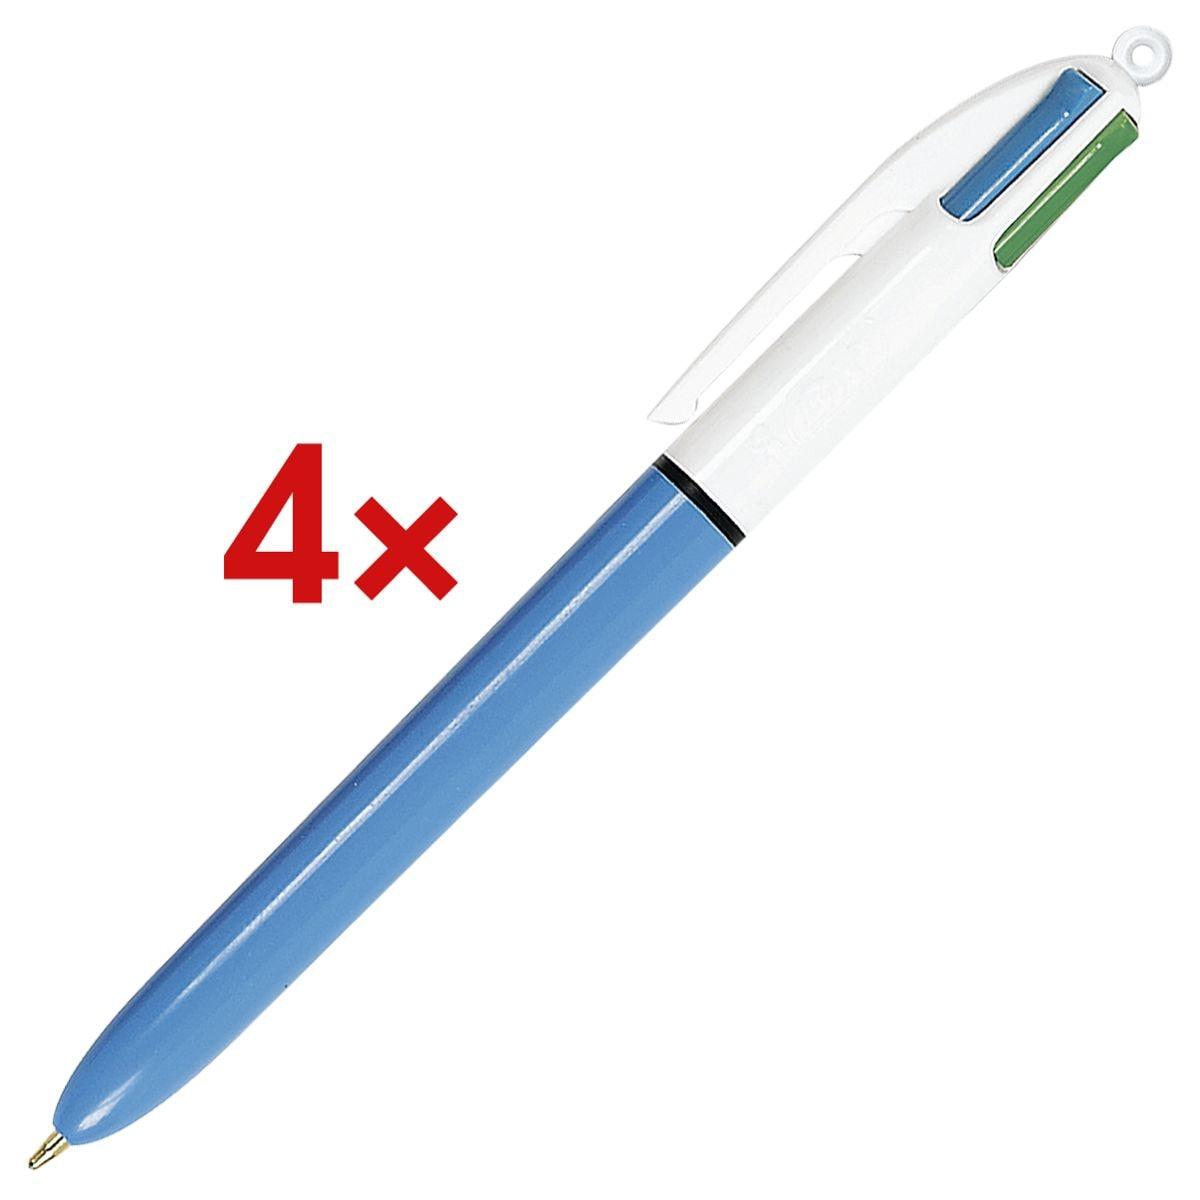 4x Meerkleuren balpen BIC 4 Colours, documentecht